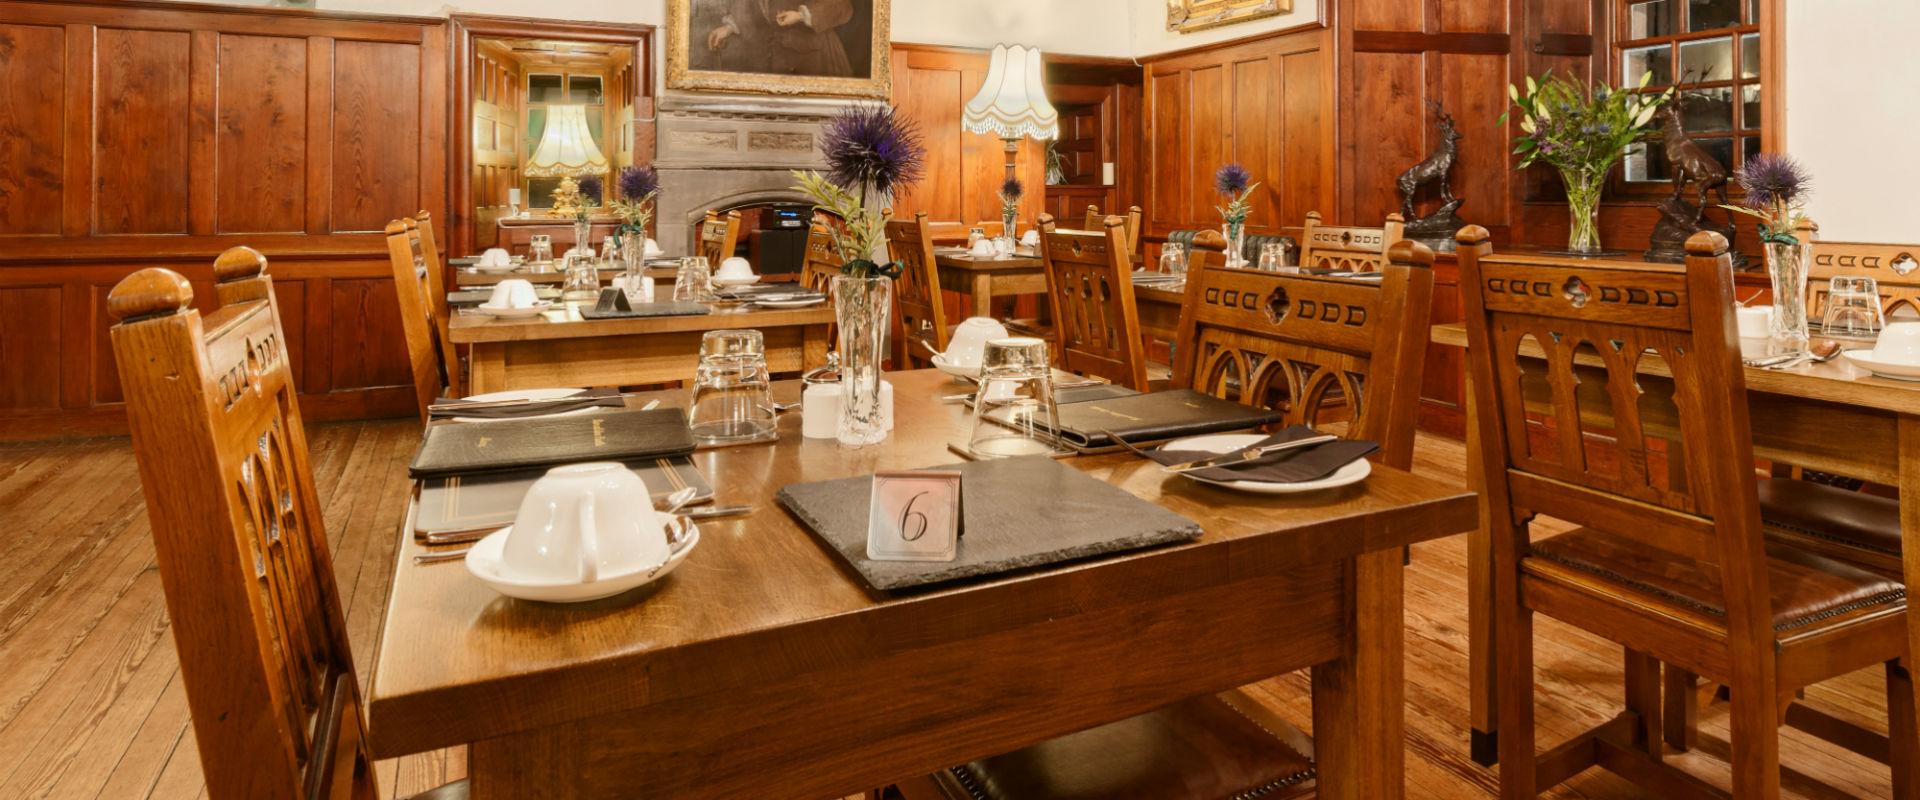 Black Castle Restaurant serving European Food from New Chef John Larkins